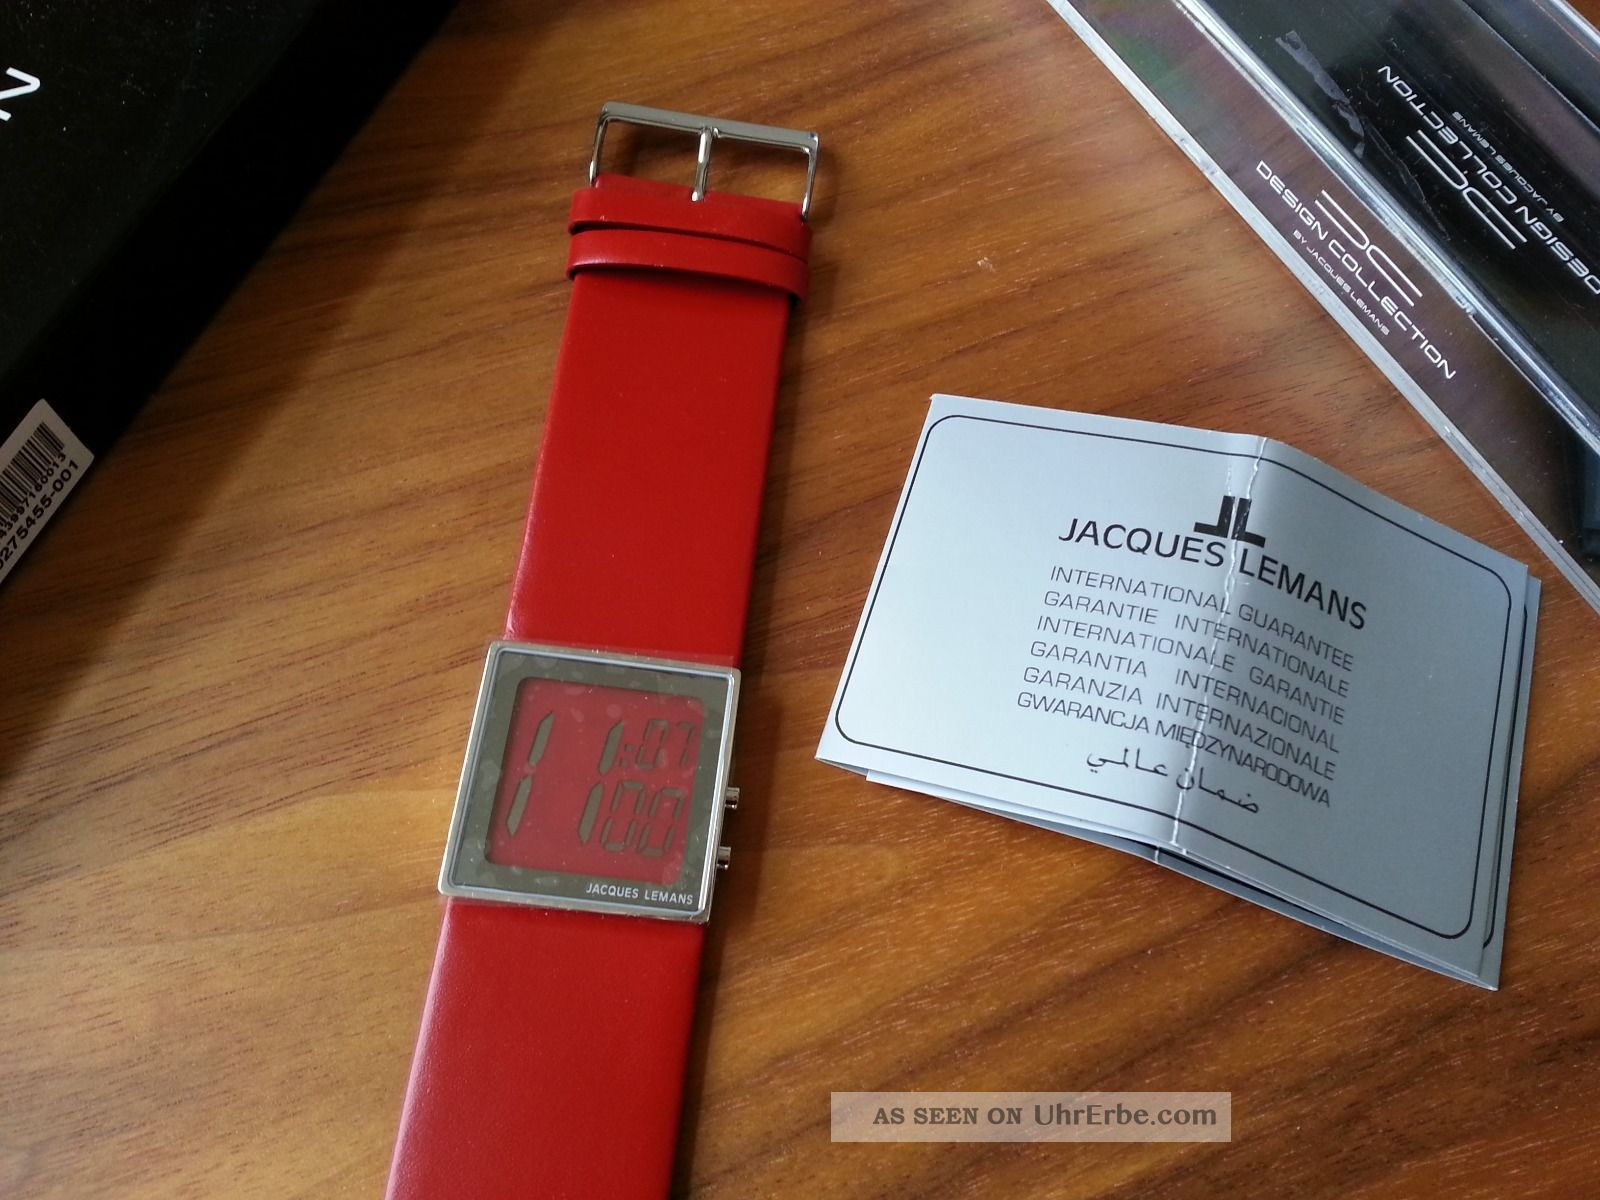 Jaques Lemans Eckige Fossil Damenuhr Rot Lederband Geschenk Uhr Armbanduhren Bild